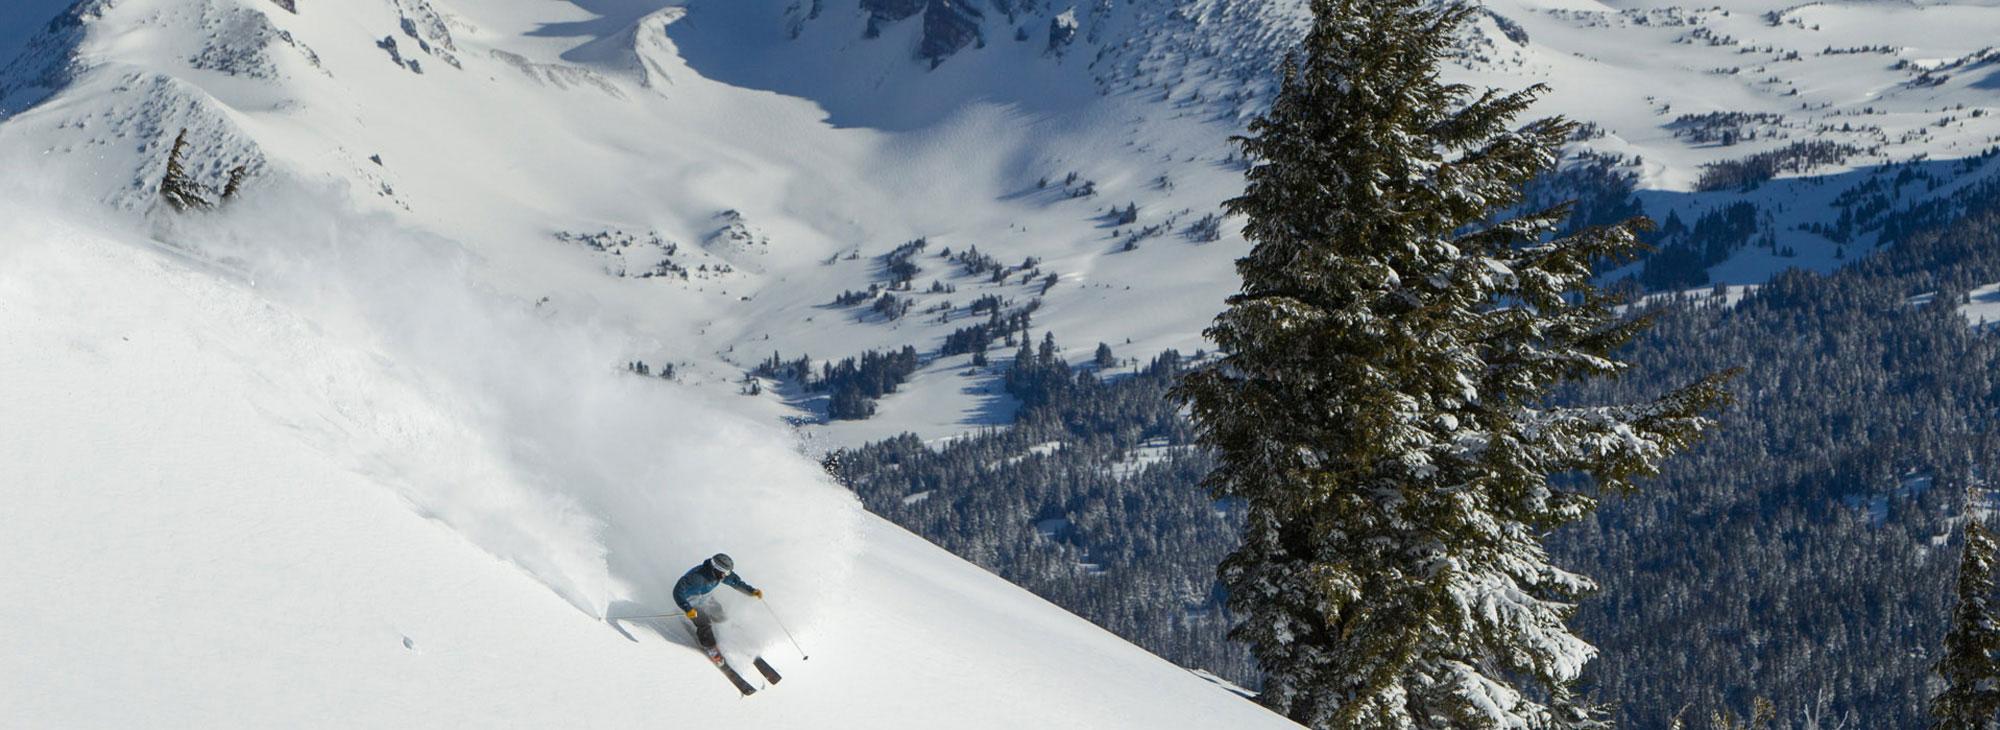 Courtesy of Mt. Bachelor Ski Area